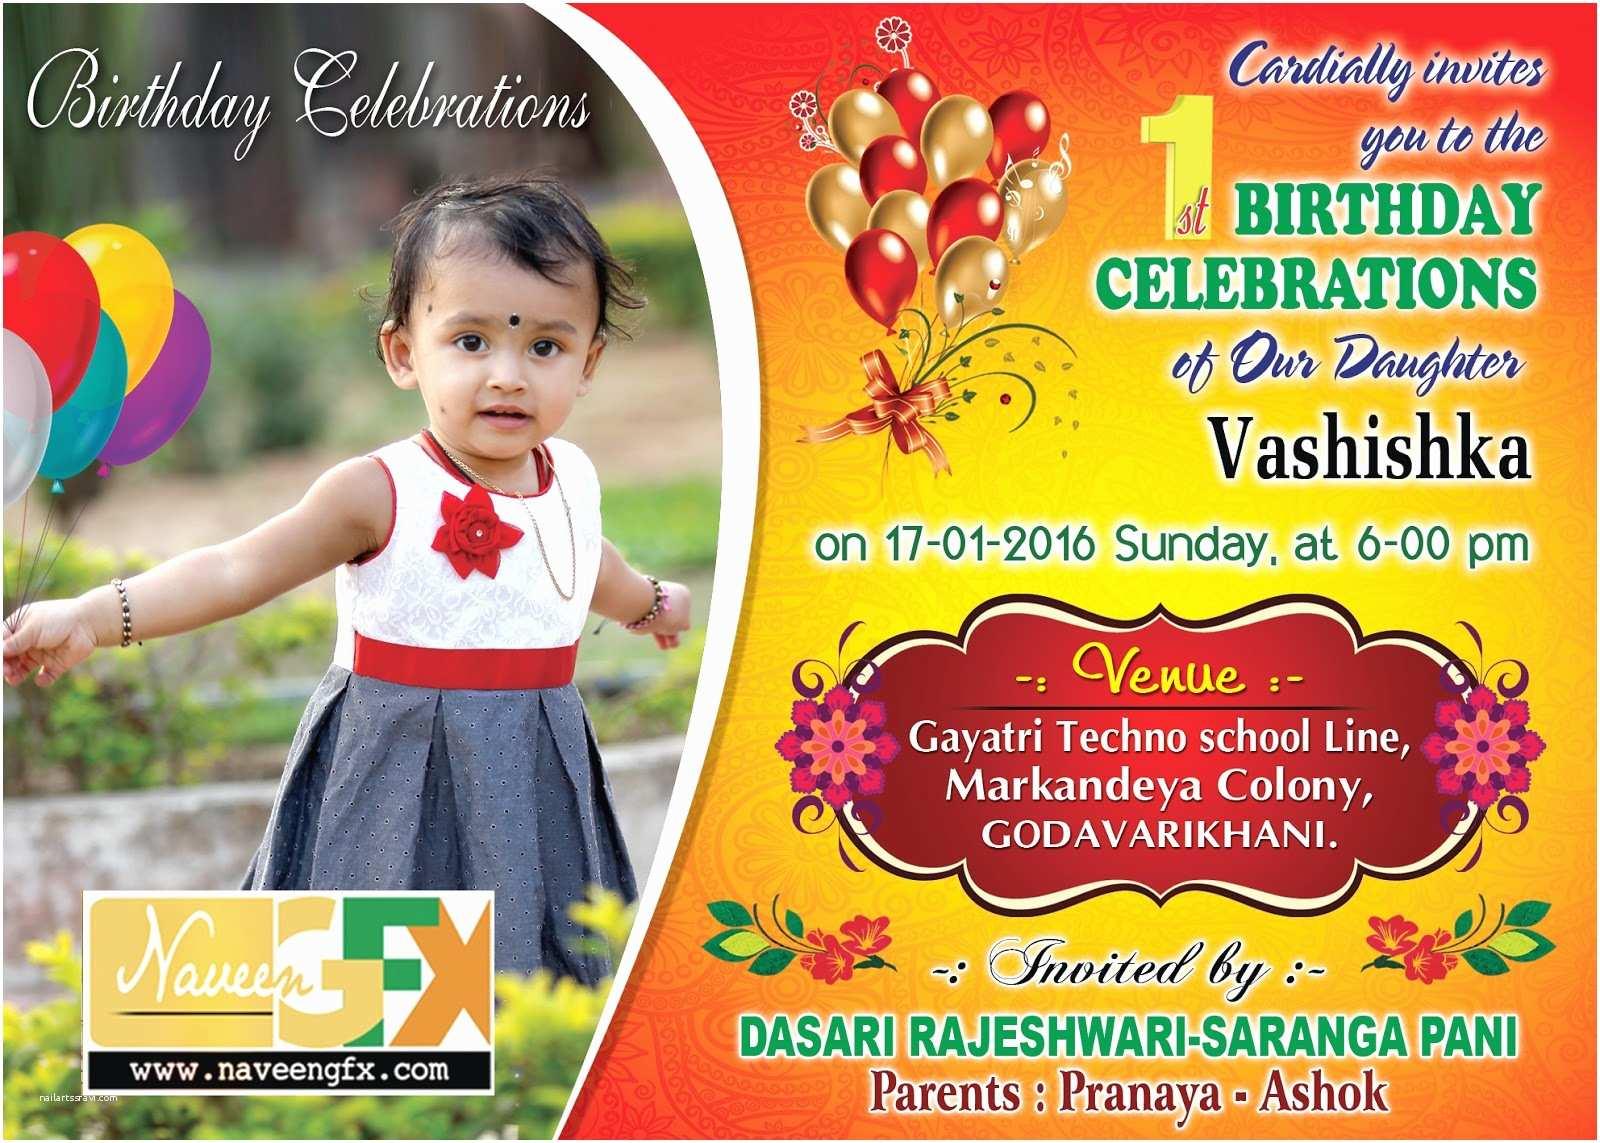 Birthday Card Invitations Sample Birthday Invitations Cards Psd Templates Free